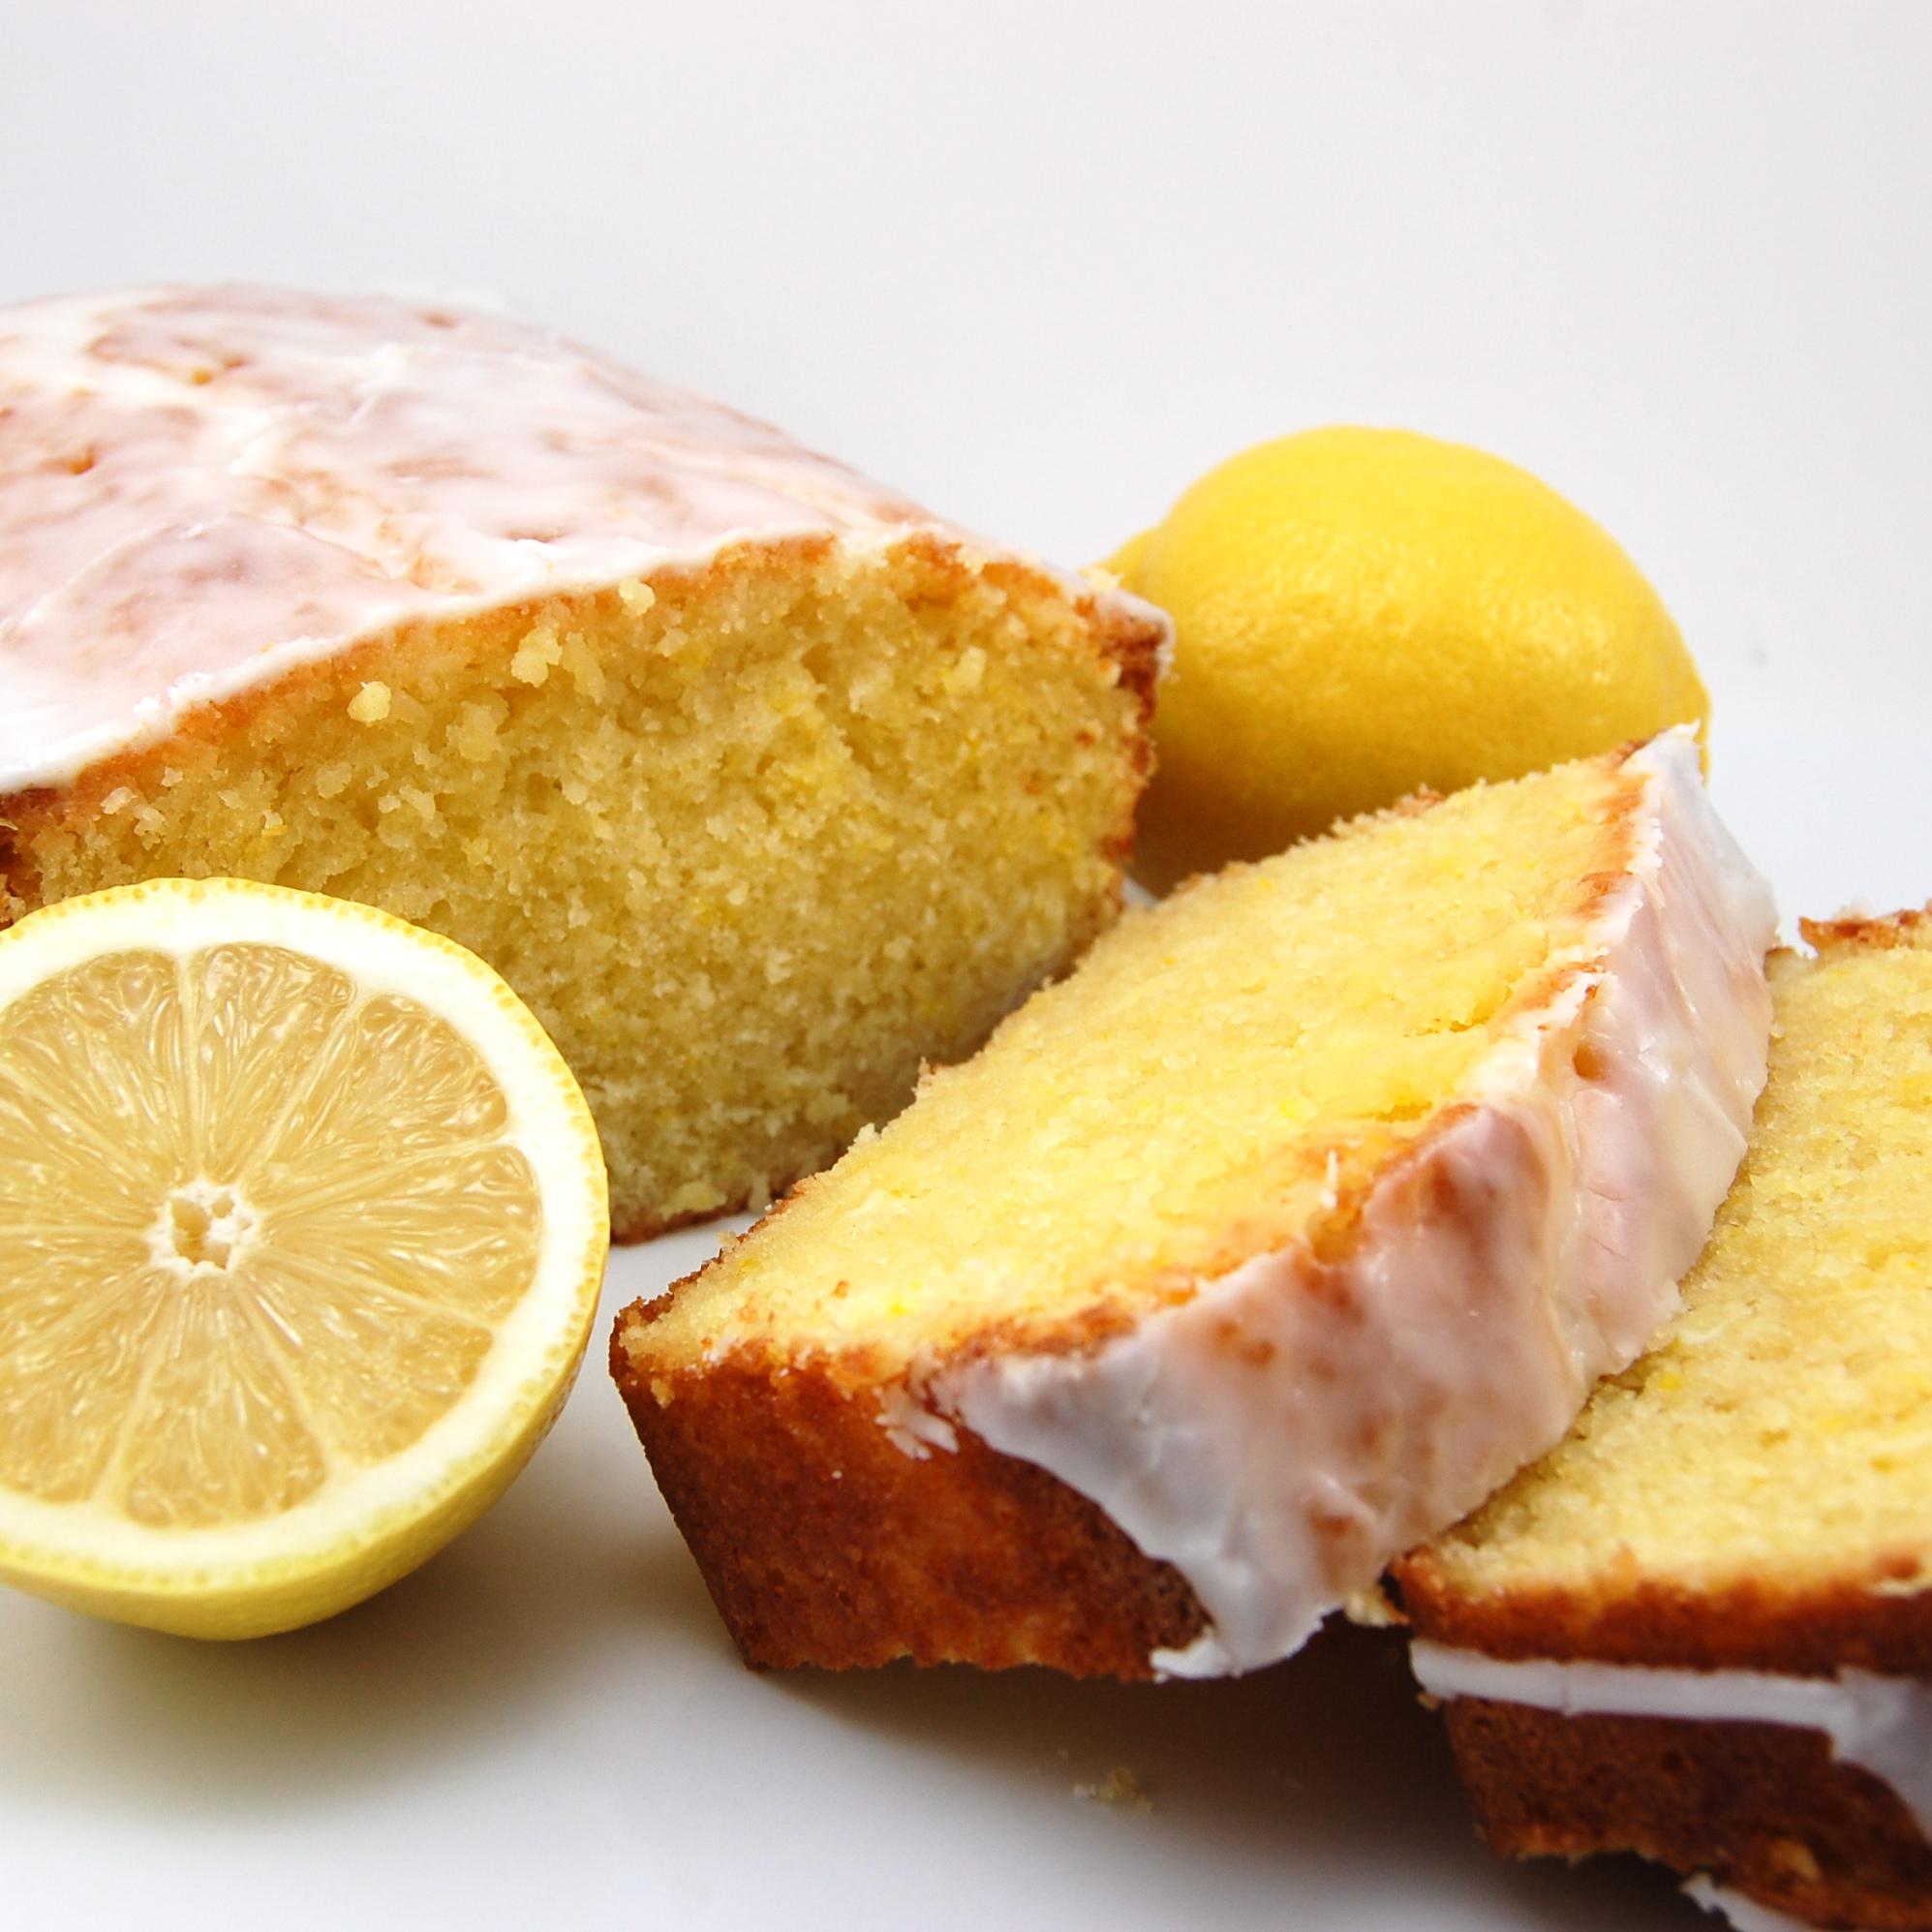 Lemon bread - Yum